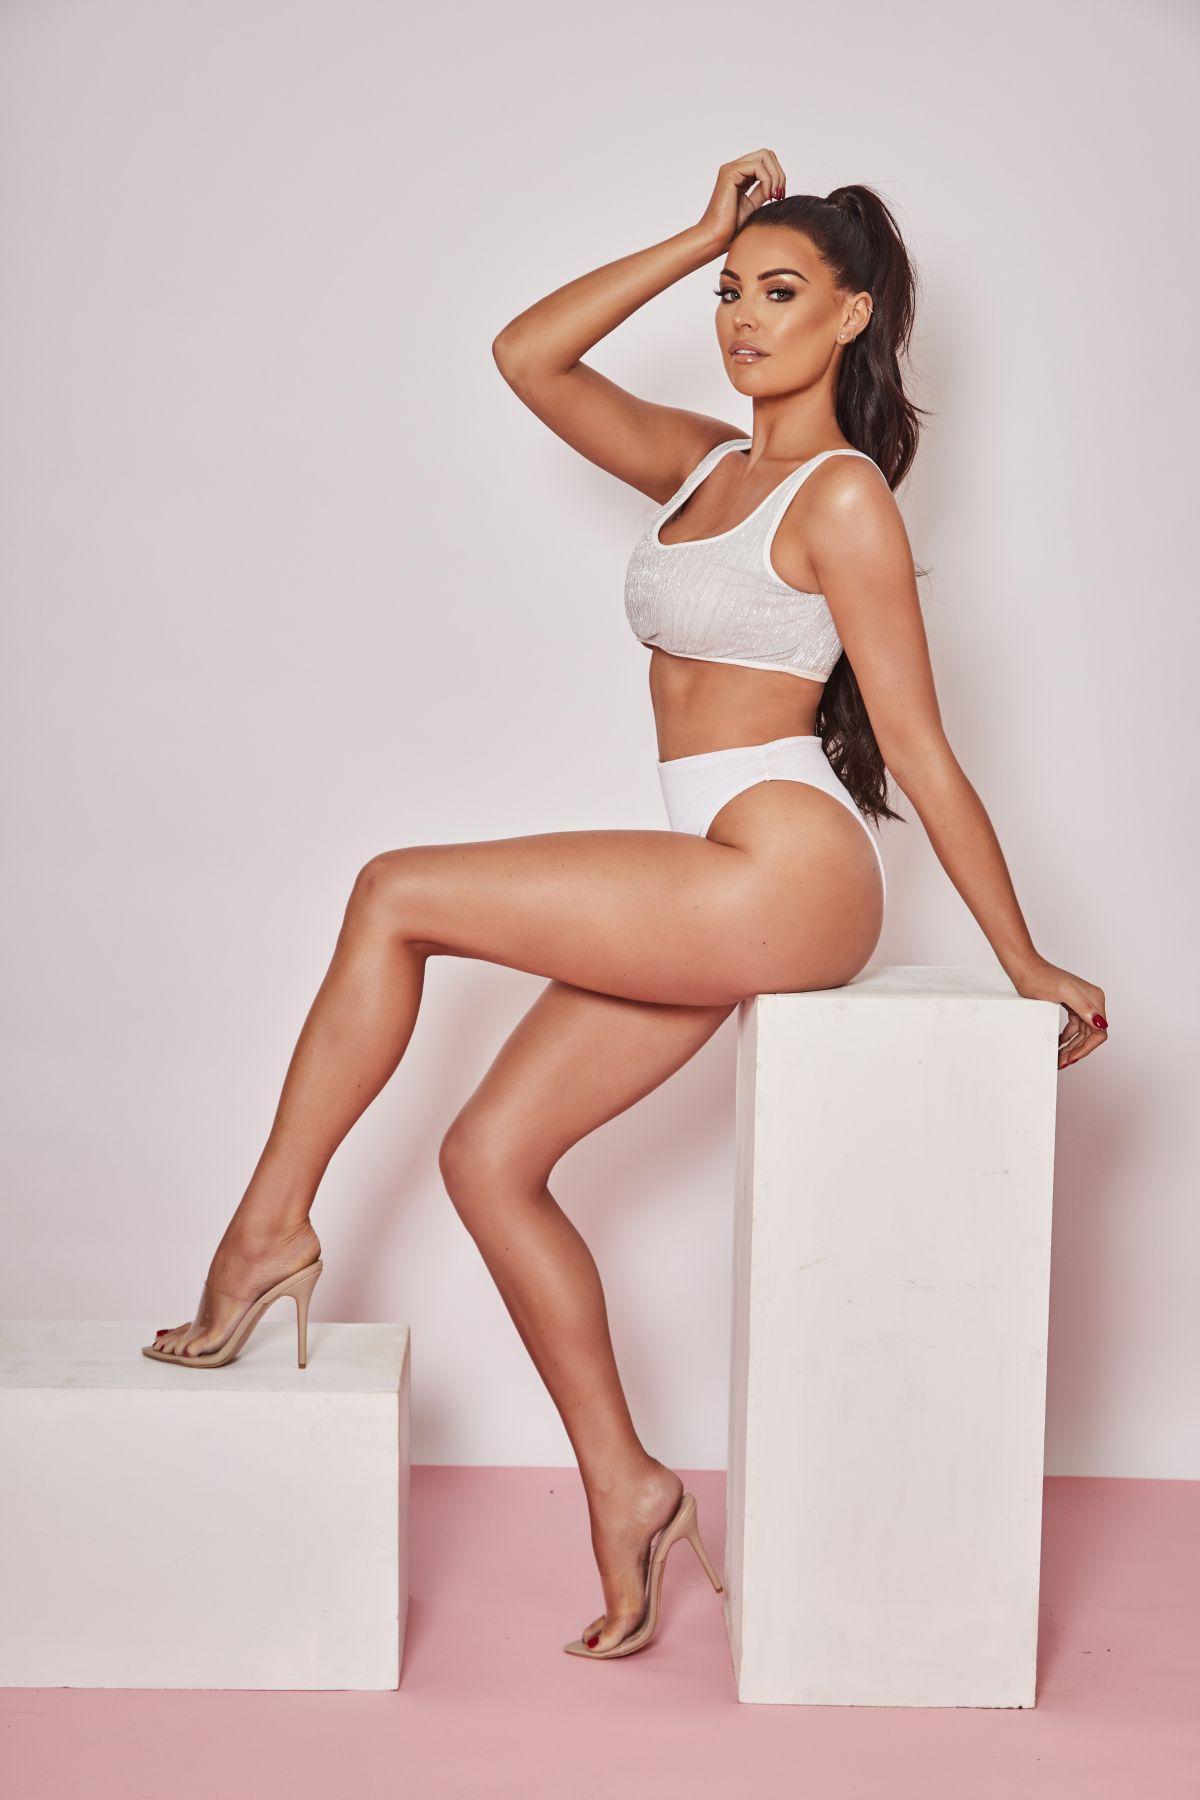 Watch Jessica wright sexy 9 photos video